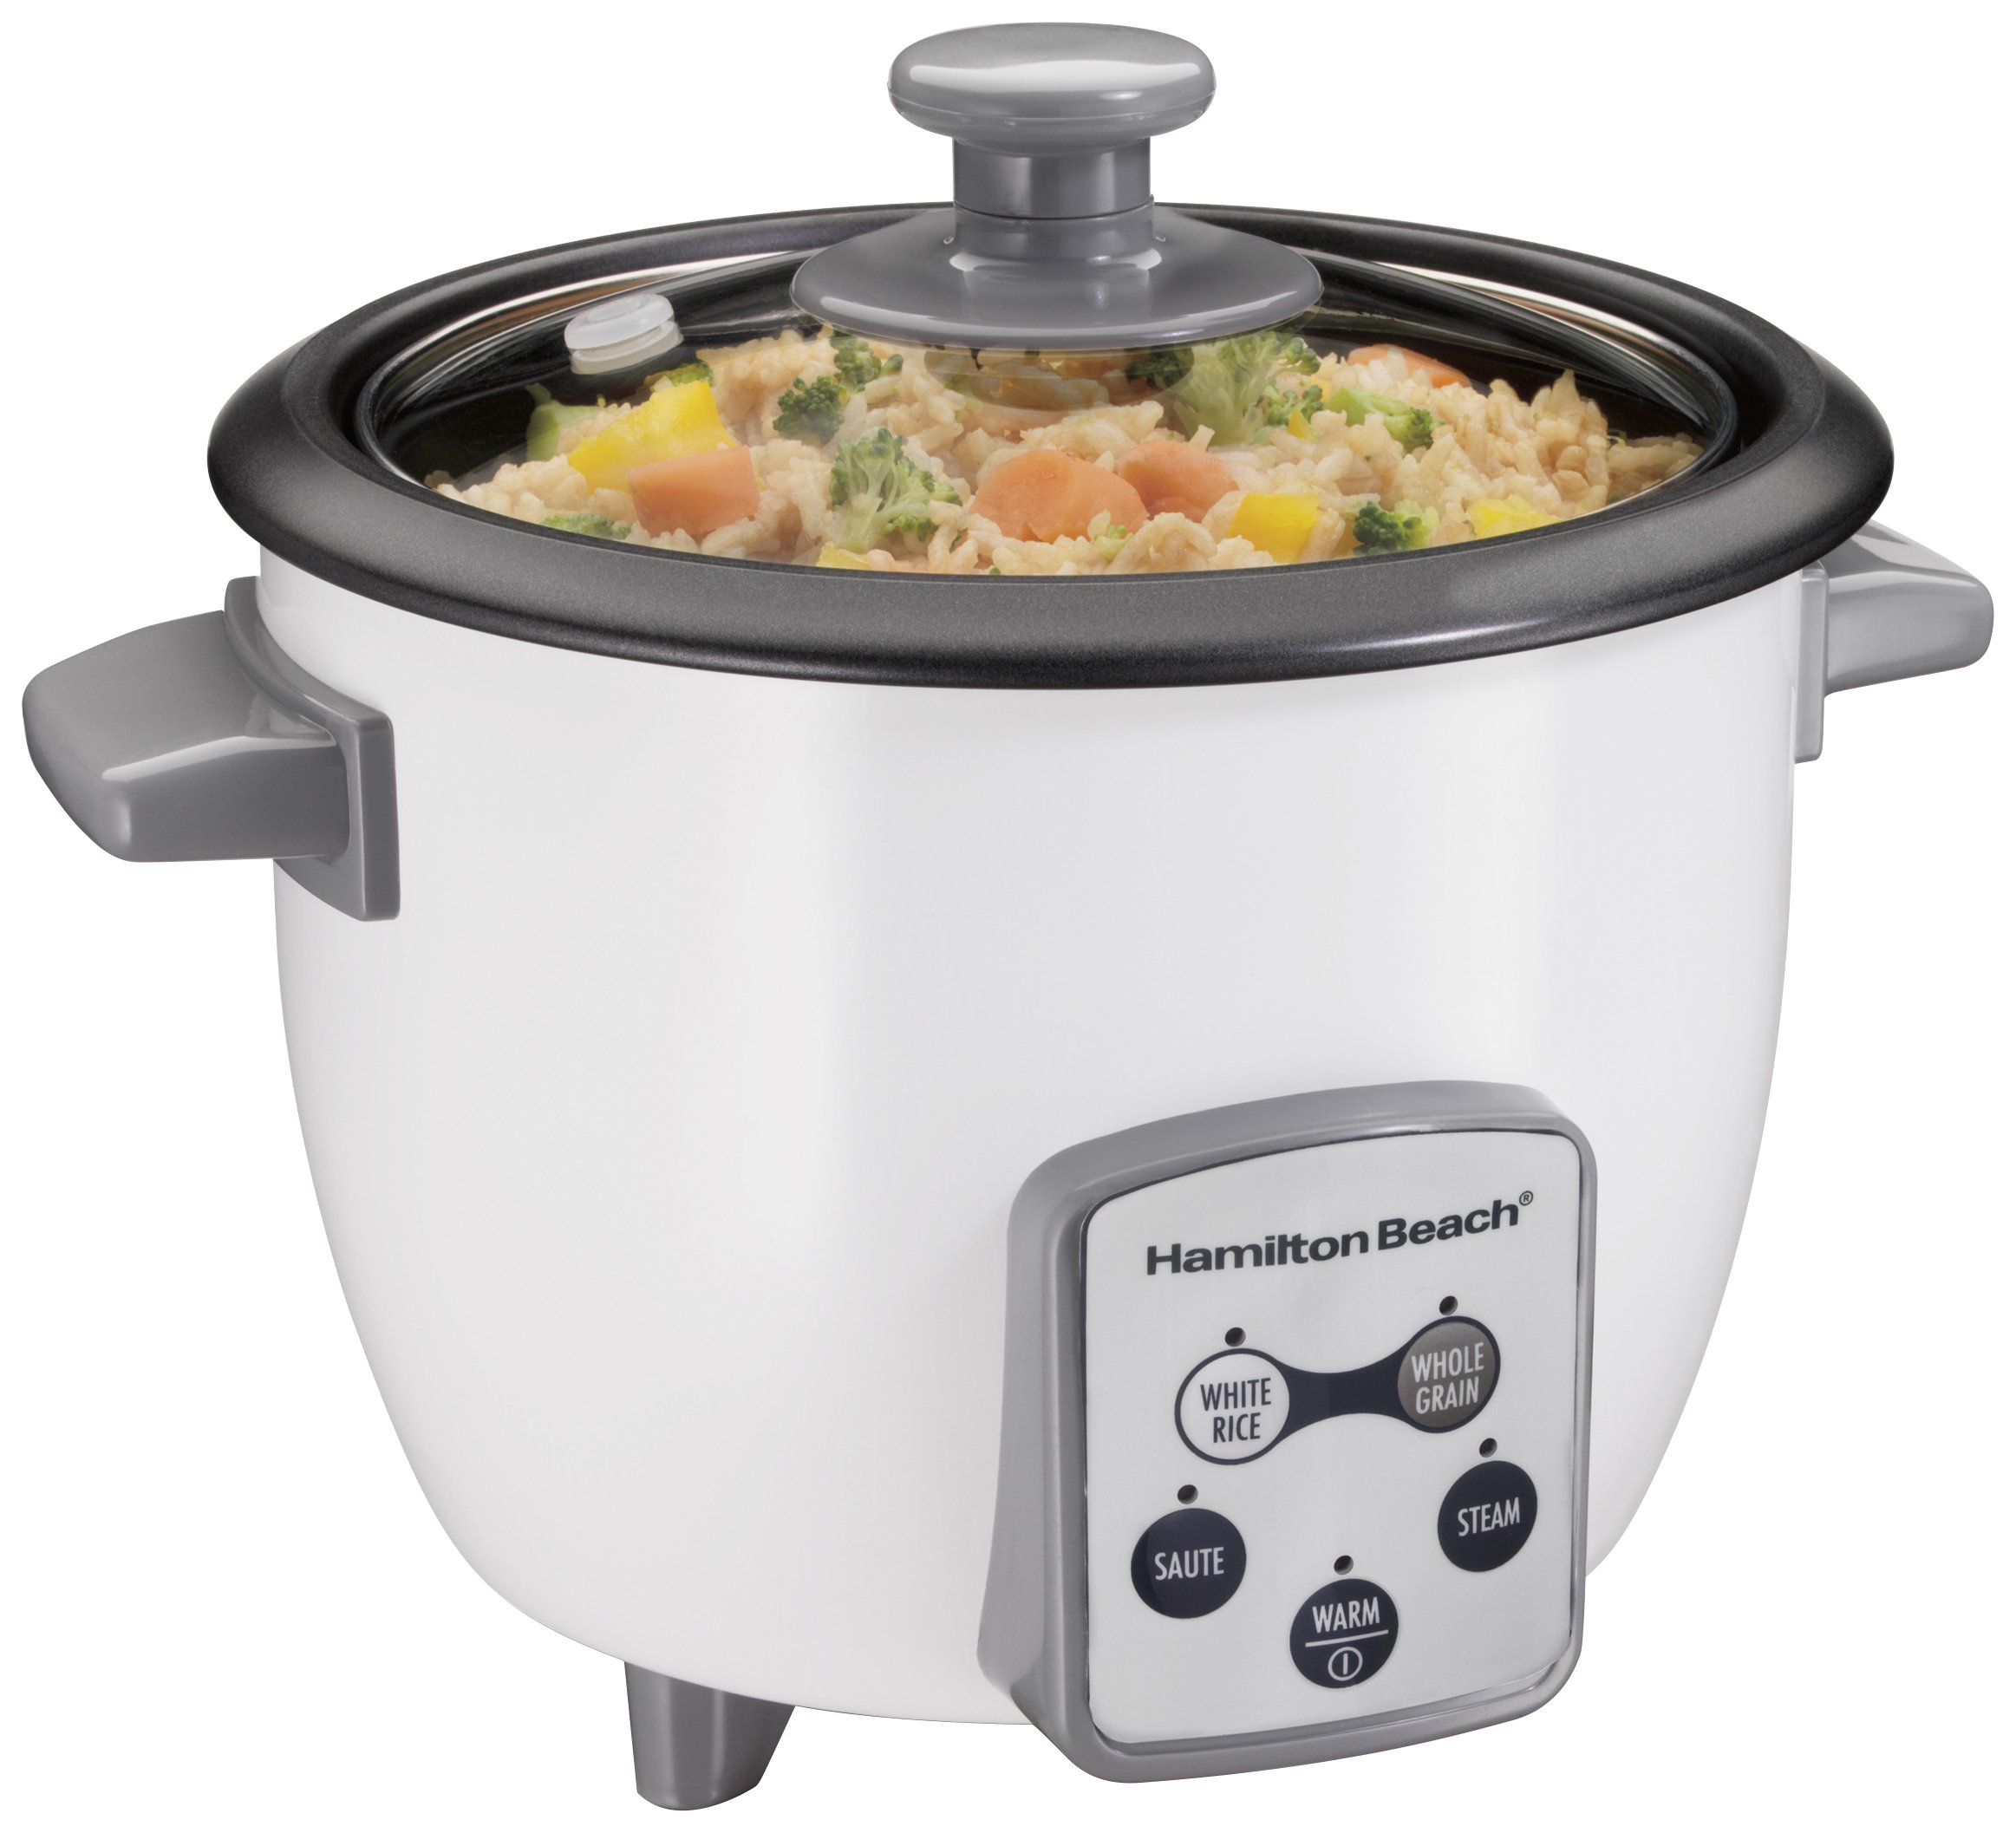 Hamilton Beach Digital Rice Cooker (37506)